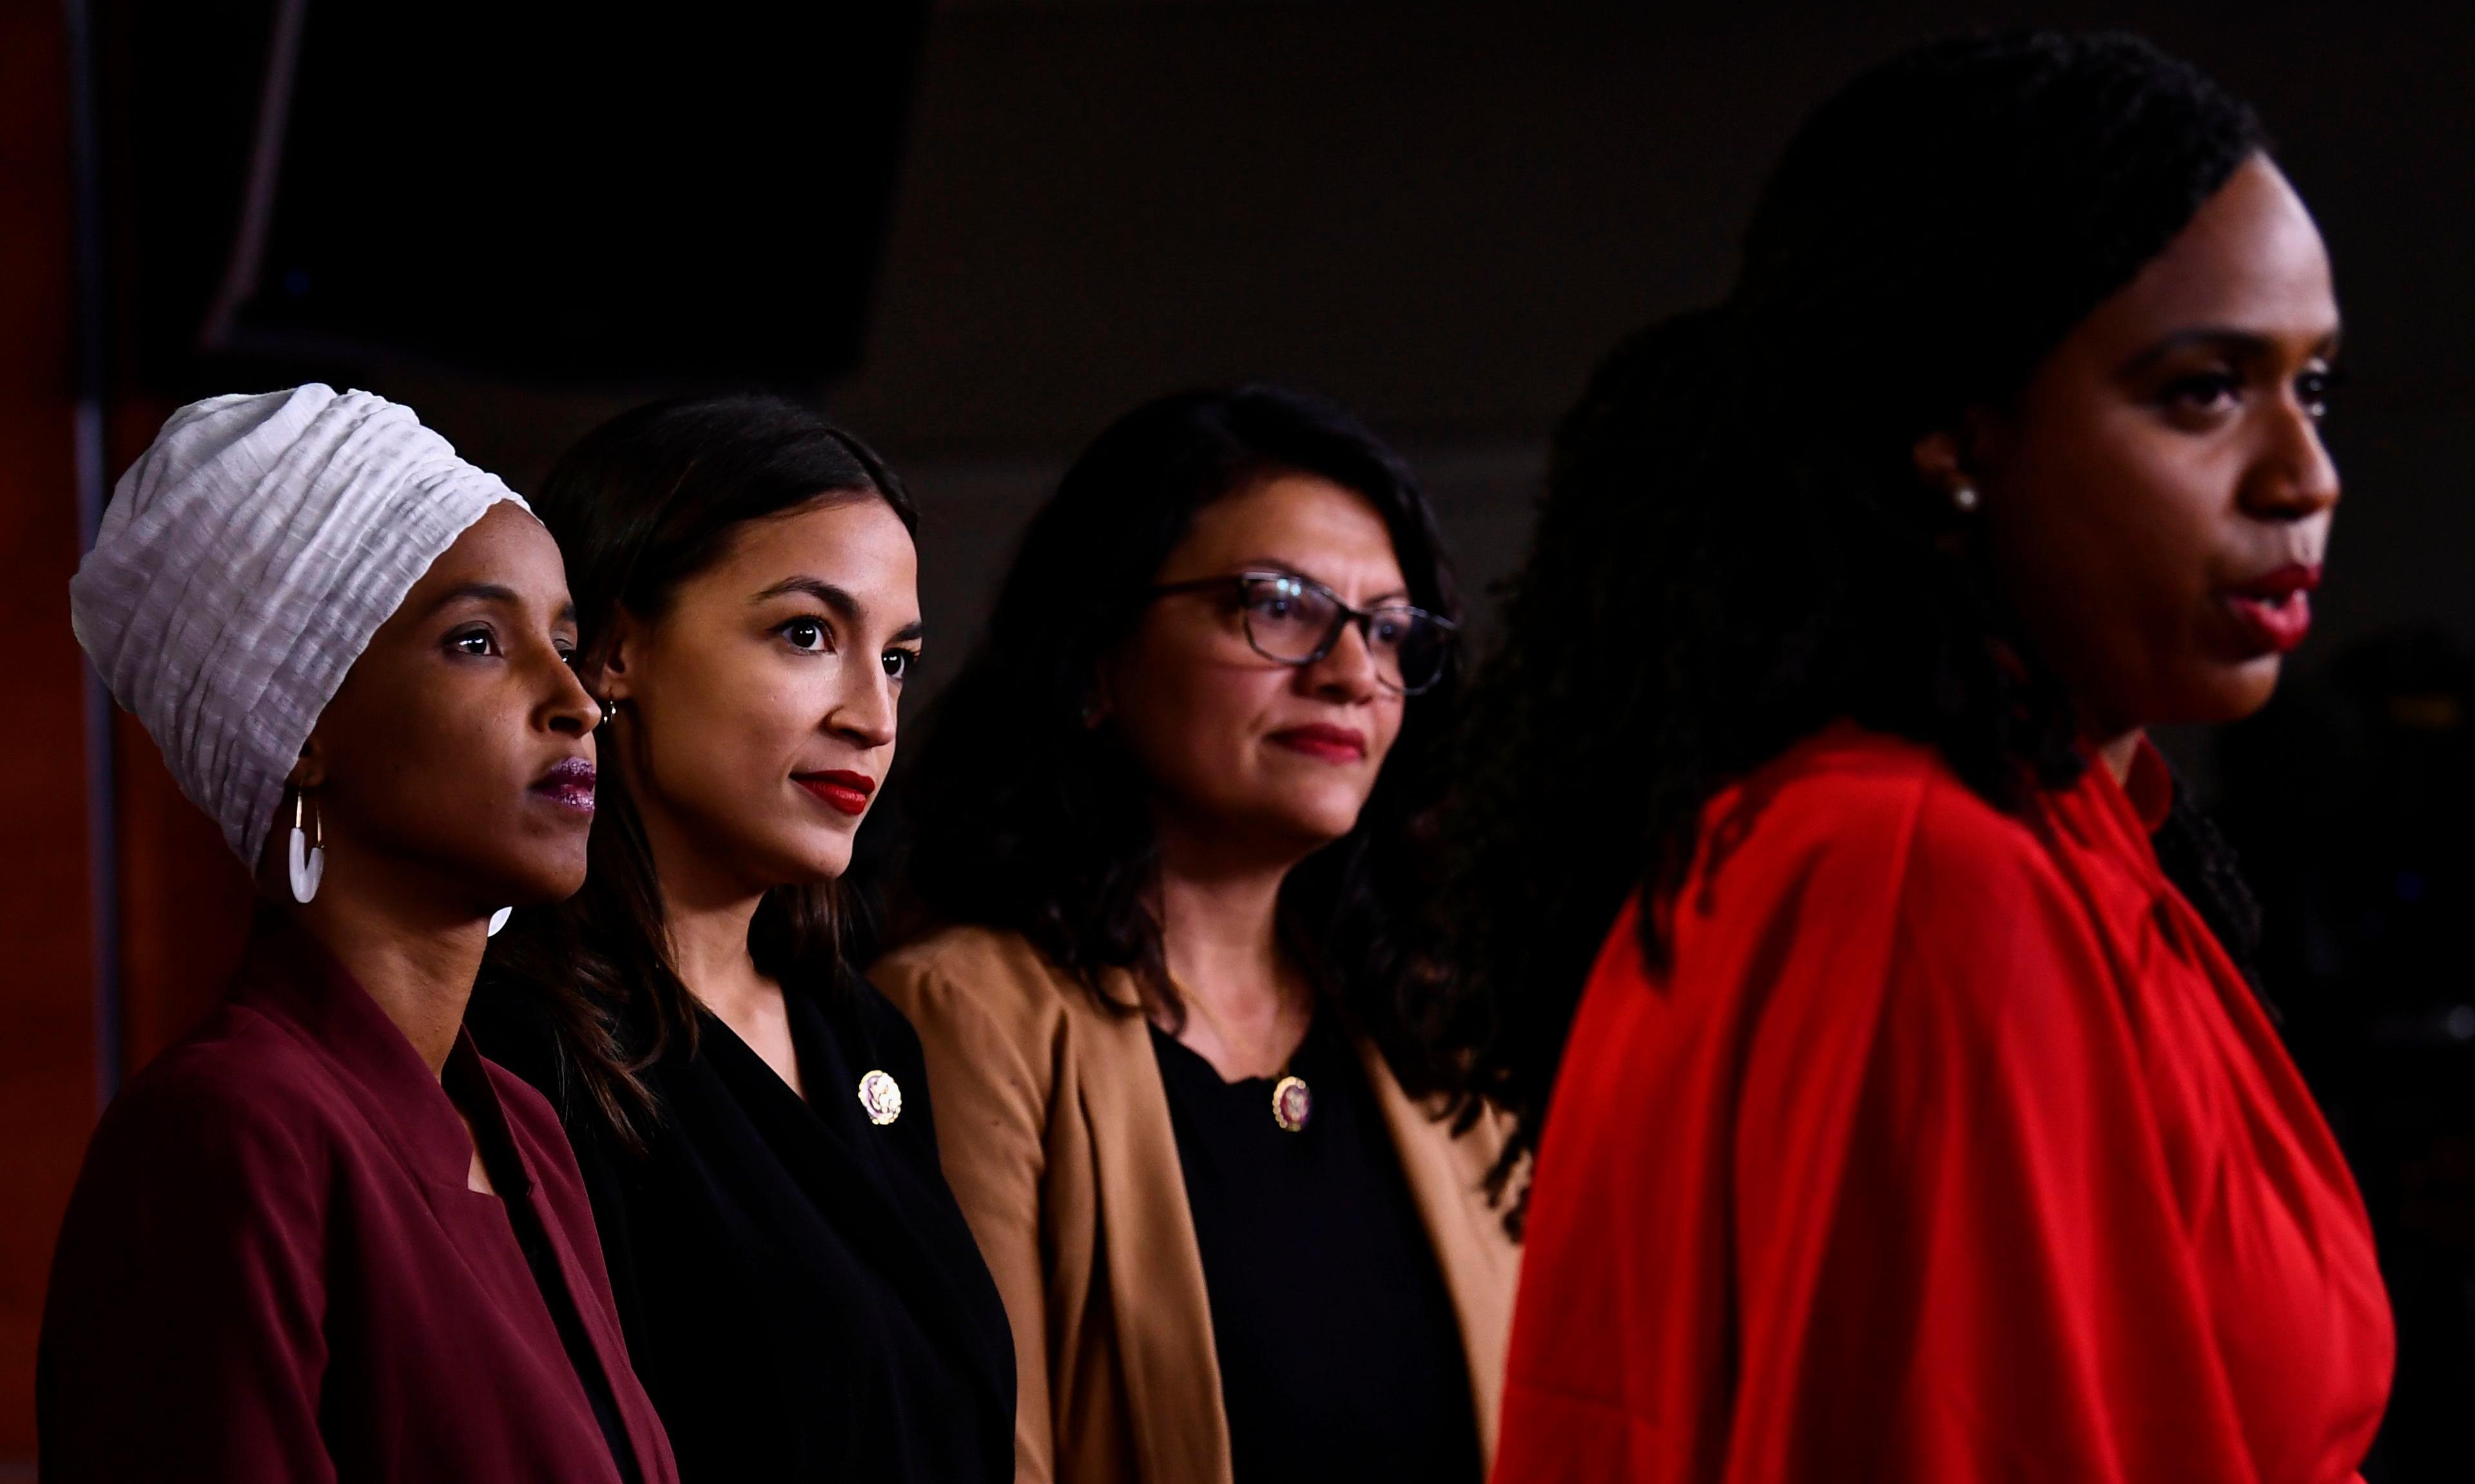 'Racist tweets': House passes resolution condemning Trump's attack on congresswomen